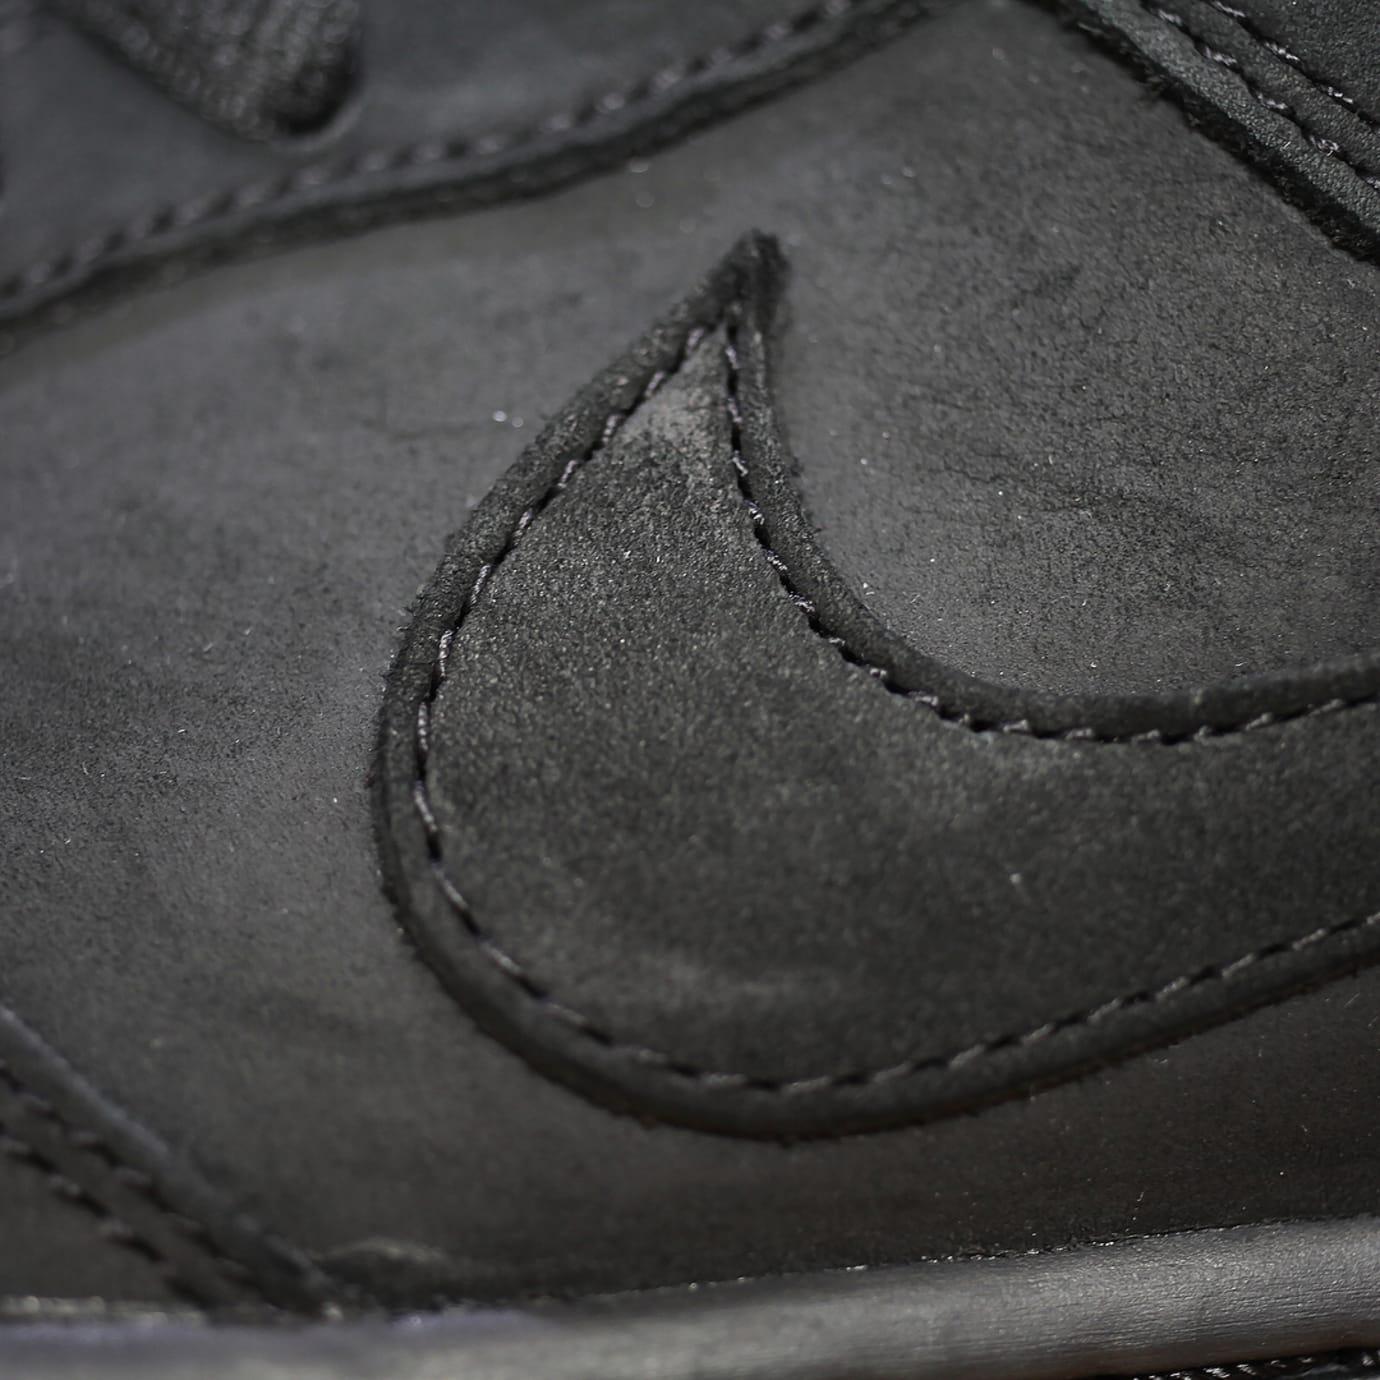 Nike SB Dunk Low Black Pigeon Release Date 88323-008 (10)